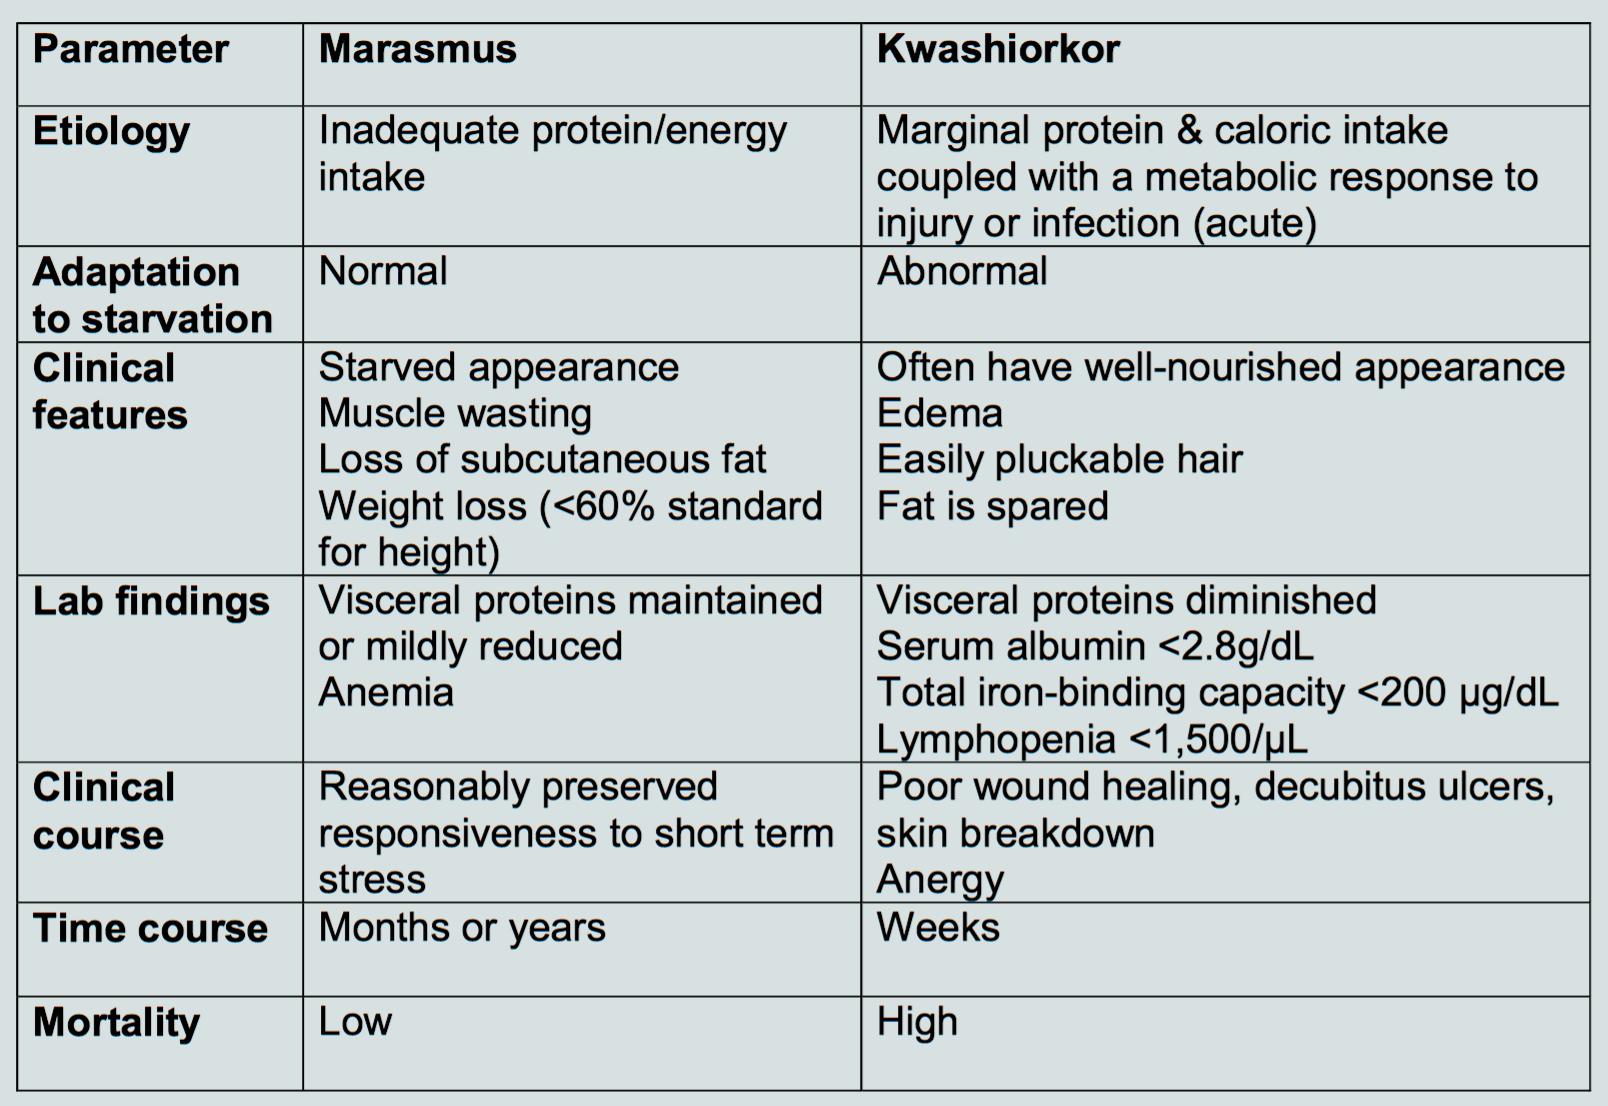 Cf Biochemistry L22 Malnutrition Unit 8 Biochemistry Flashcards